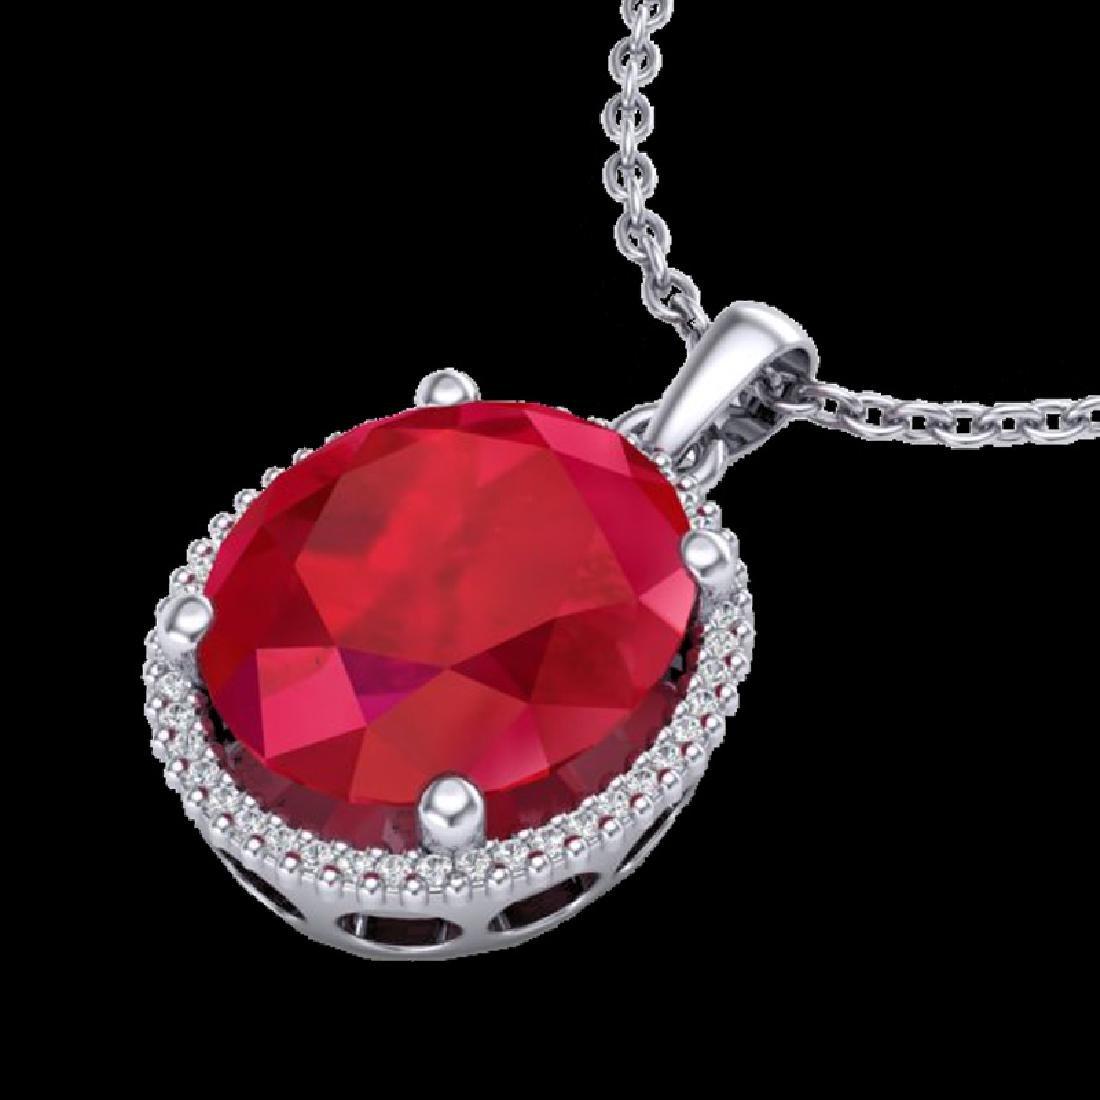 12 CTW Ruby & Micro Pave VS/SI Diamond Halo Necklace - 2